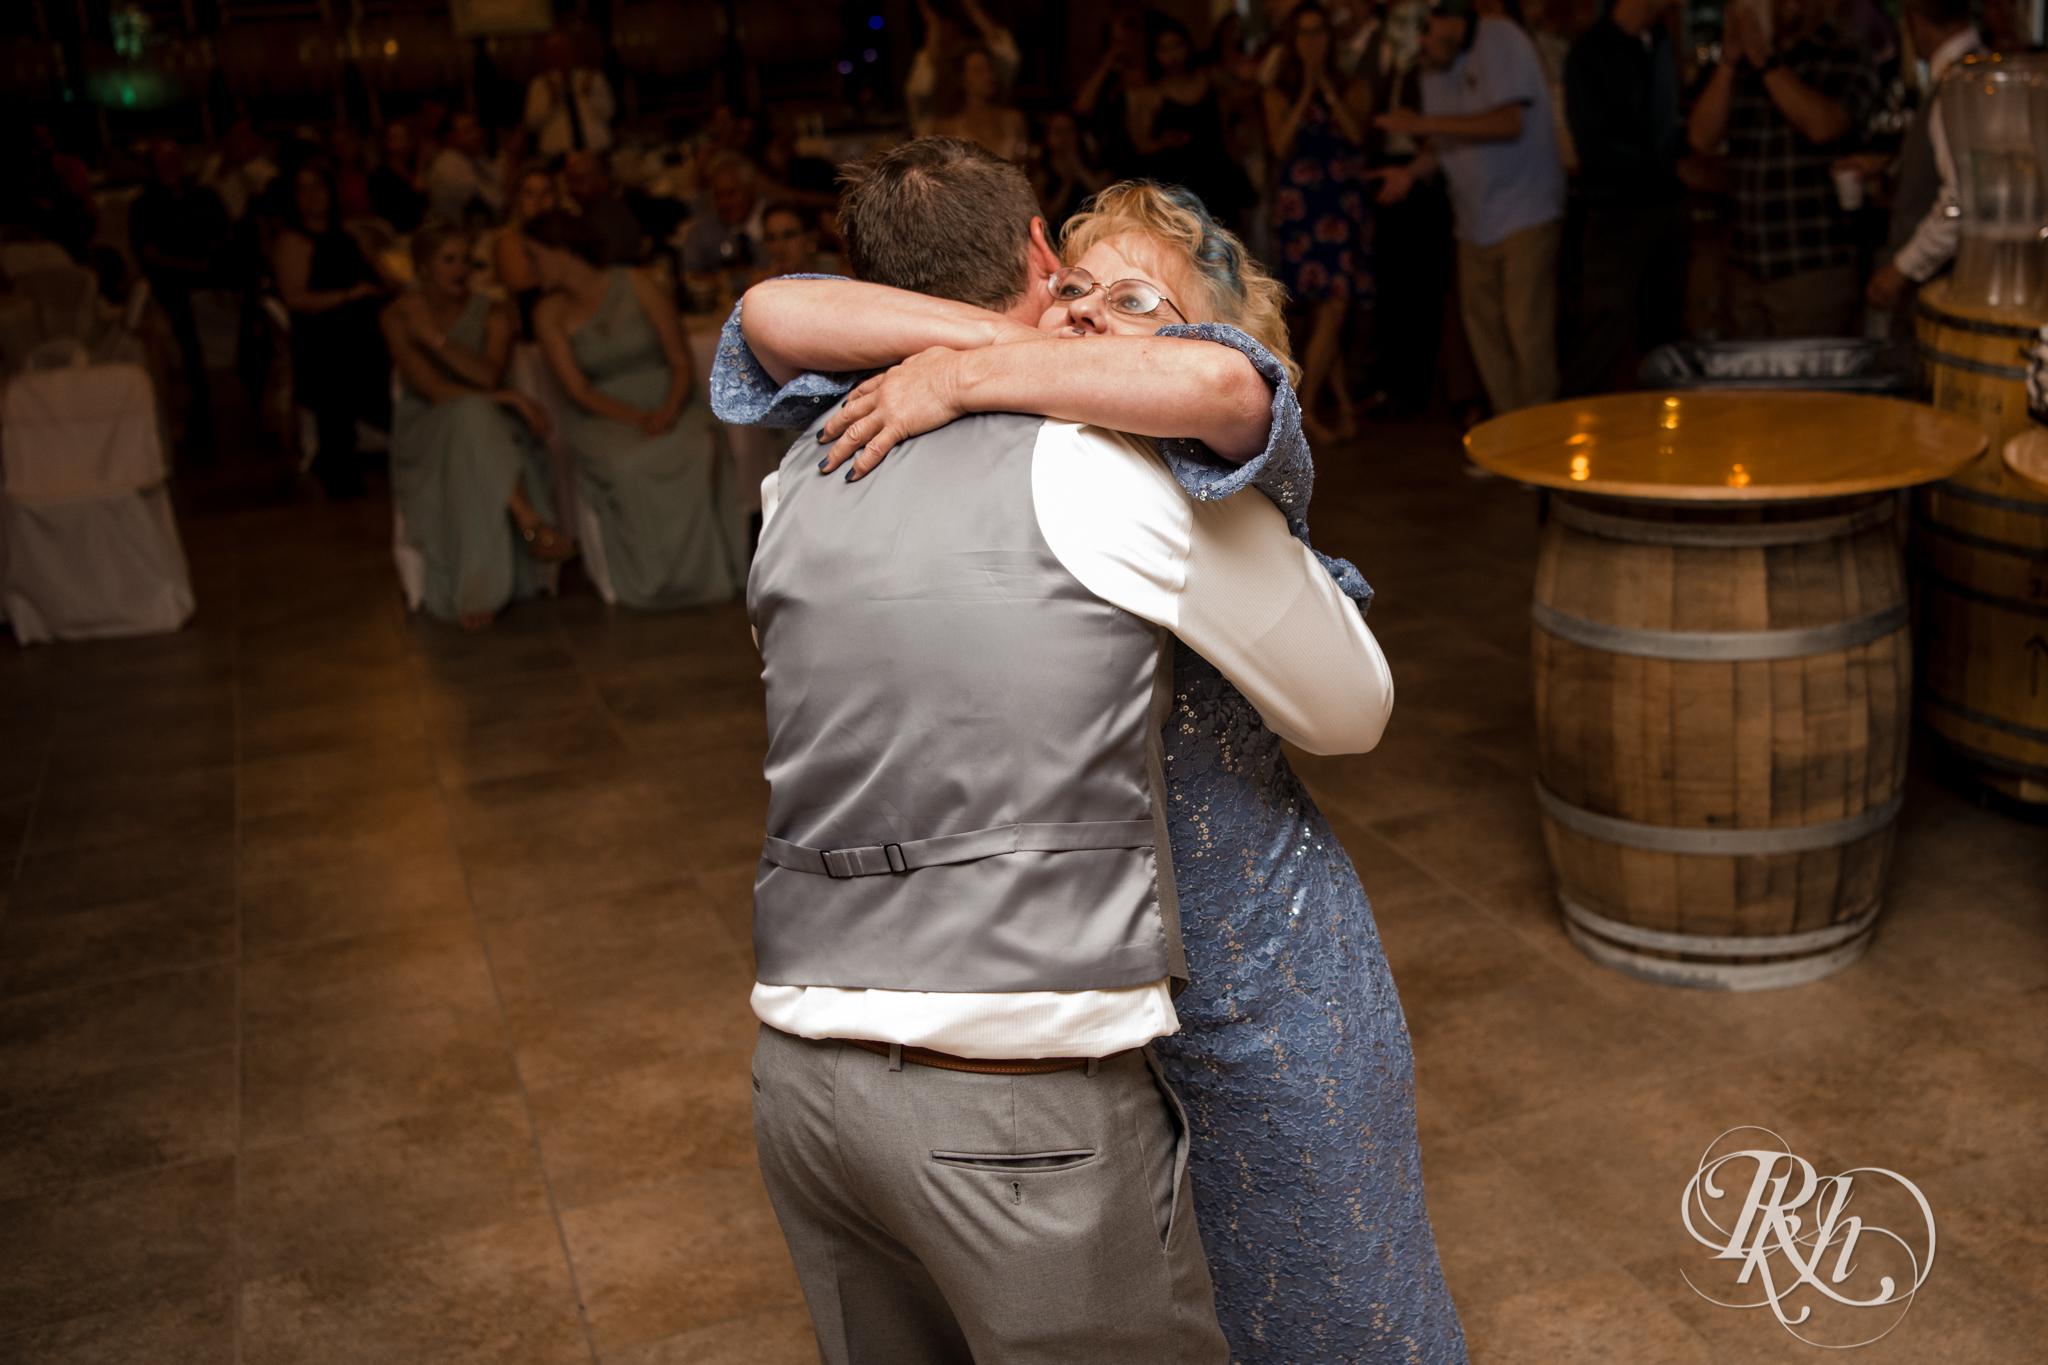 Ally & Nick - Minnesota Wedding Photography - Next Chapter Winery - RKH Images - Blog (48 of 57).jpg